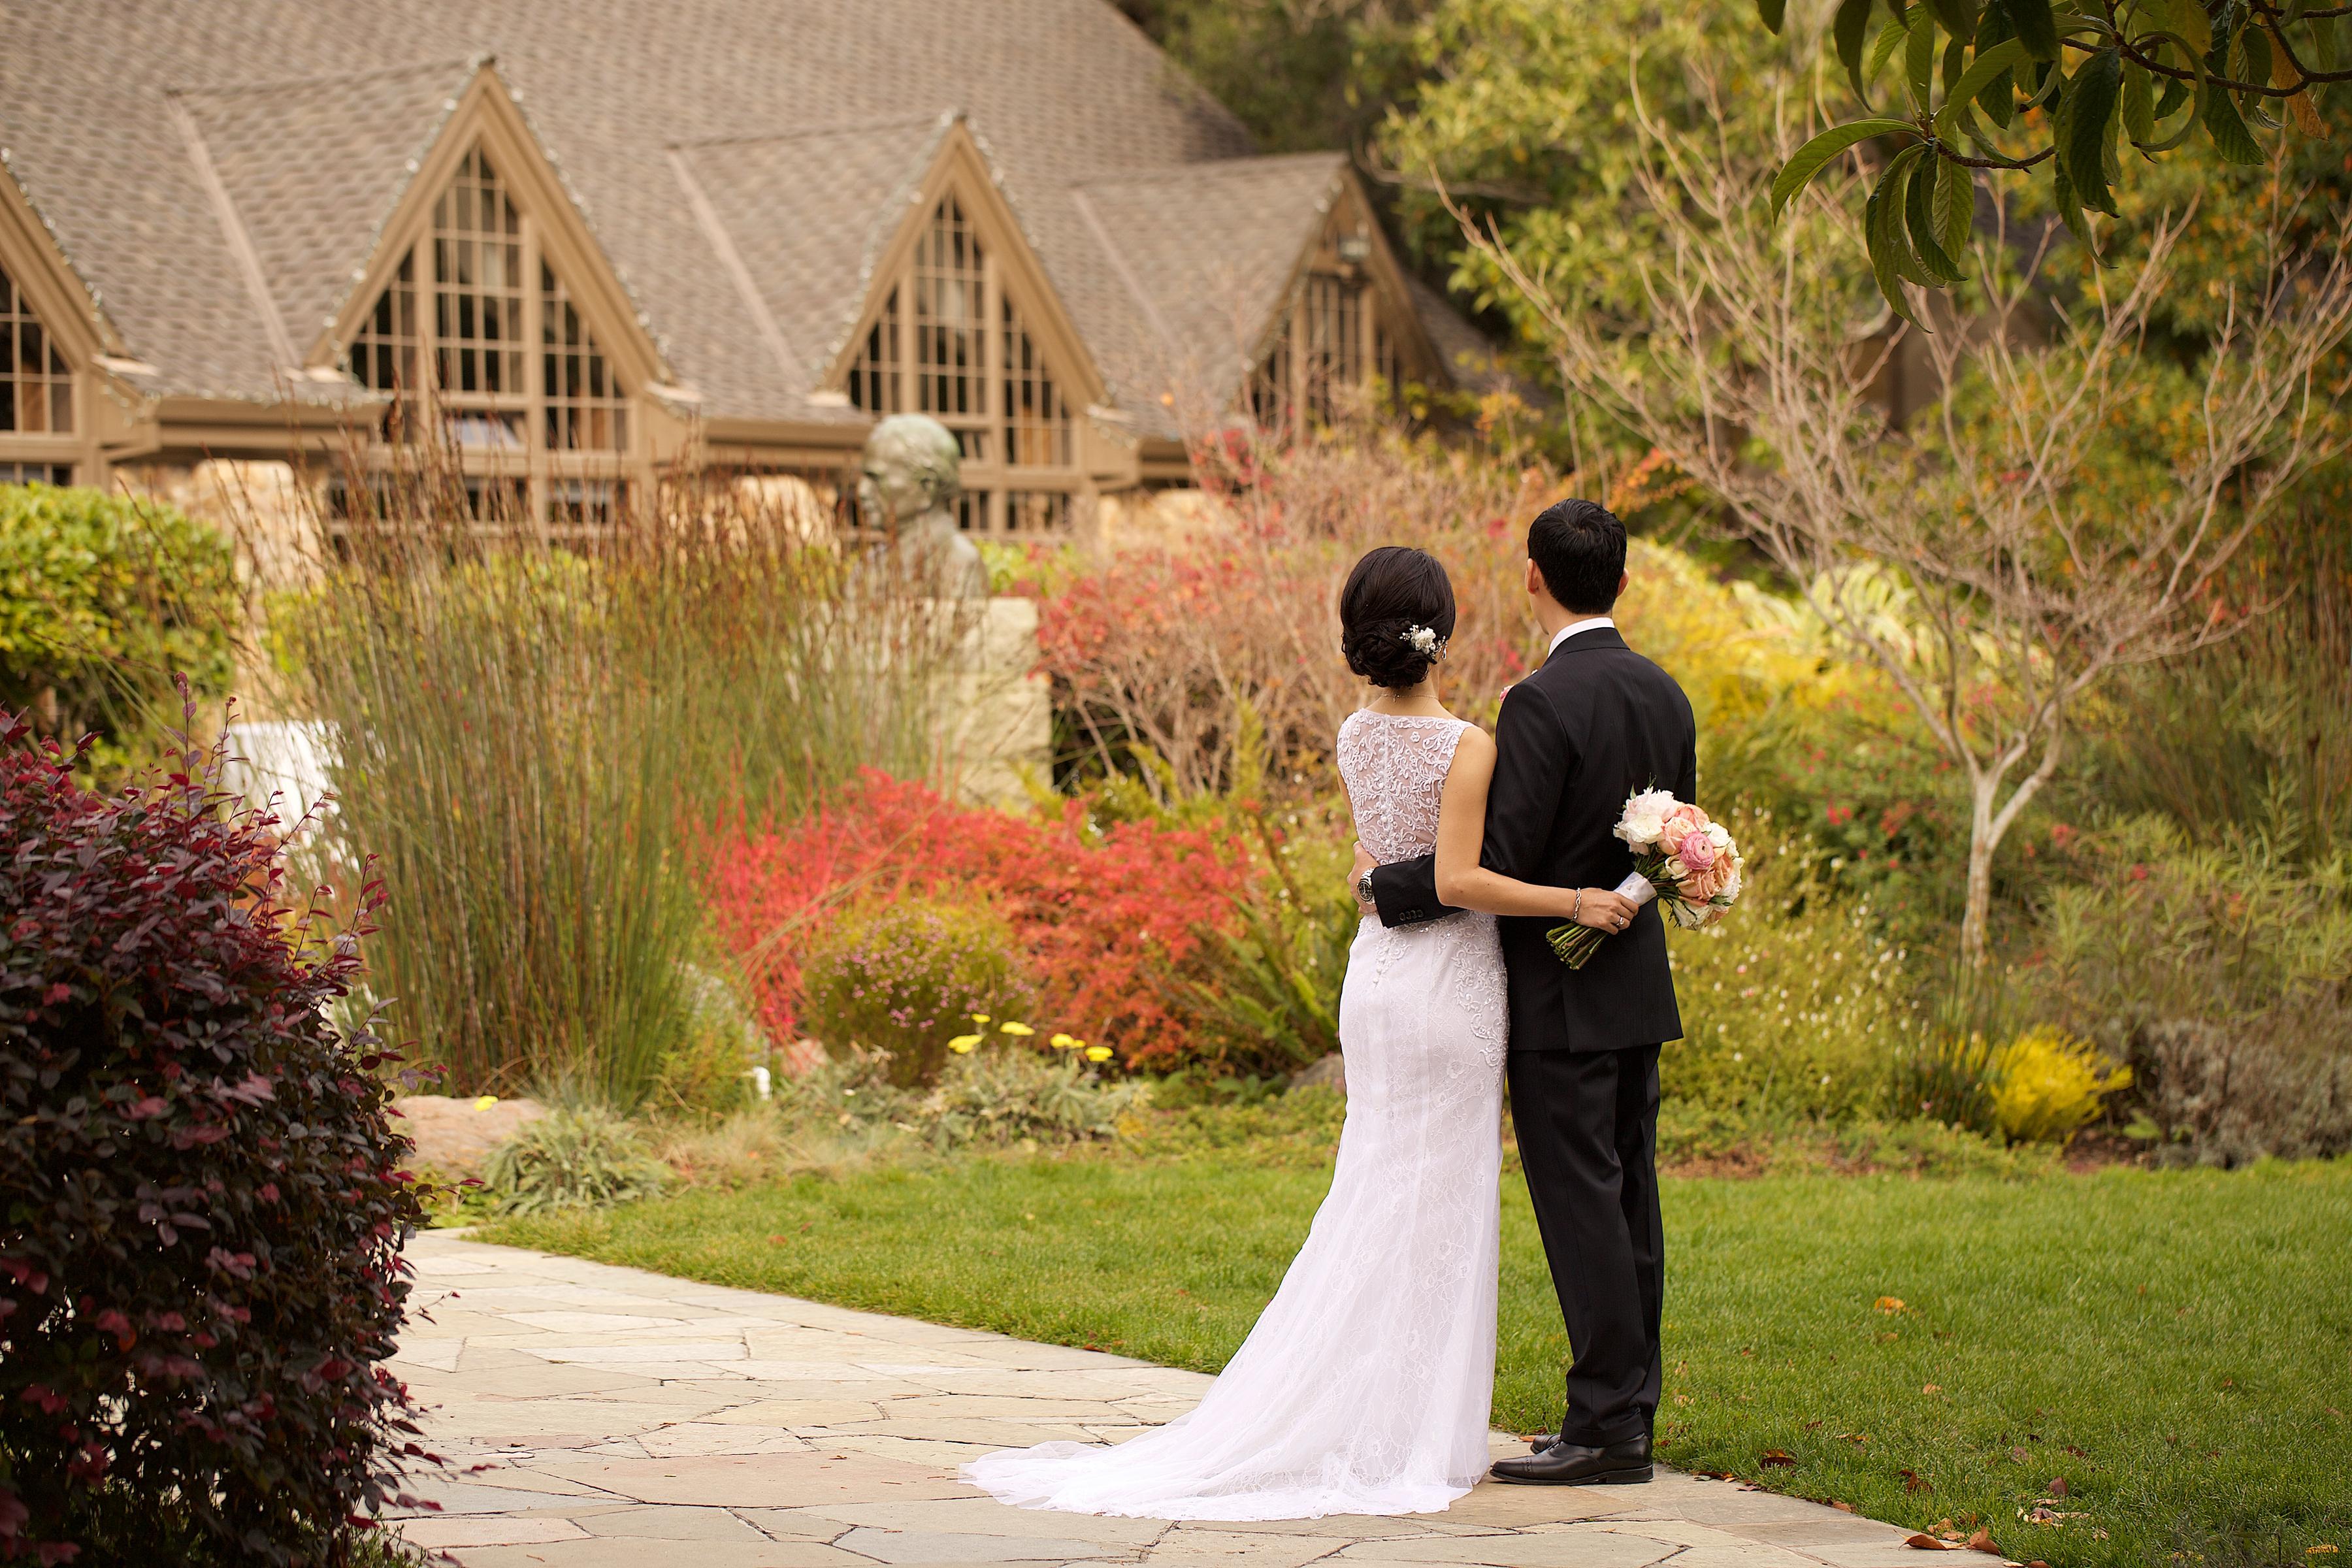 Sfbay wedding